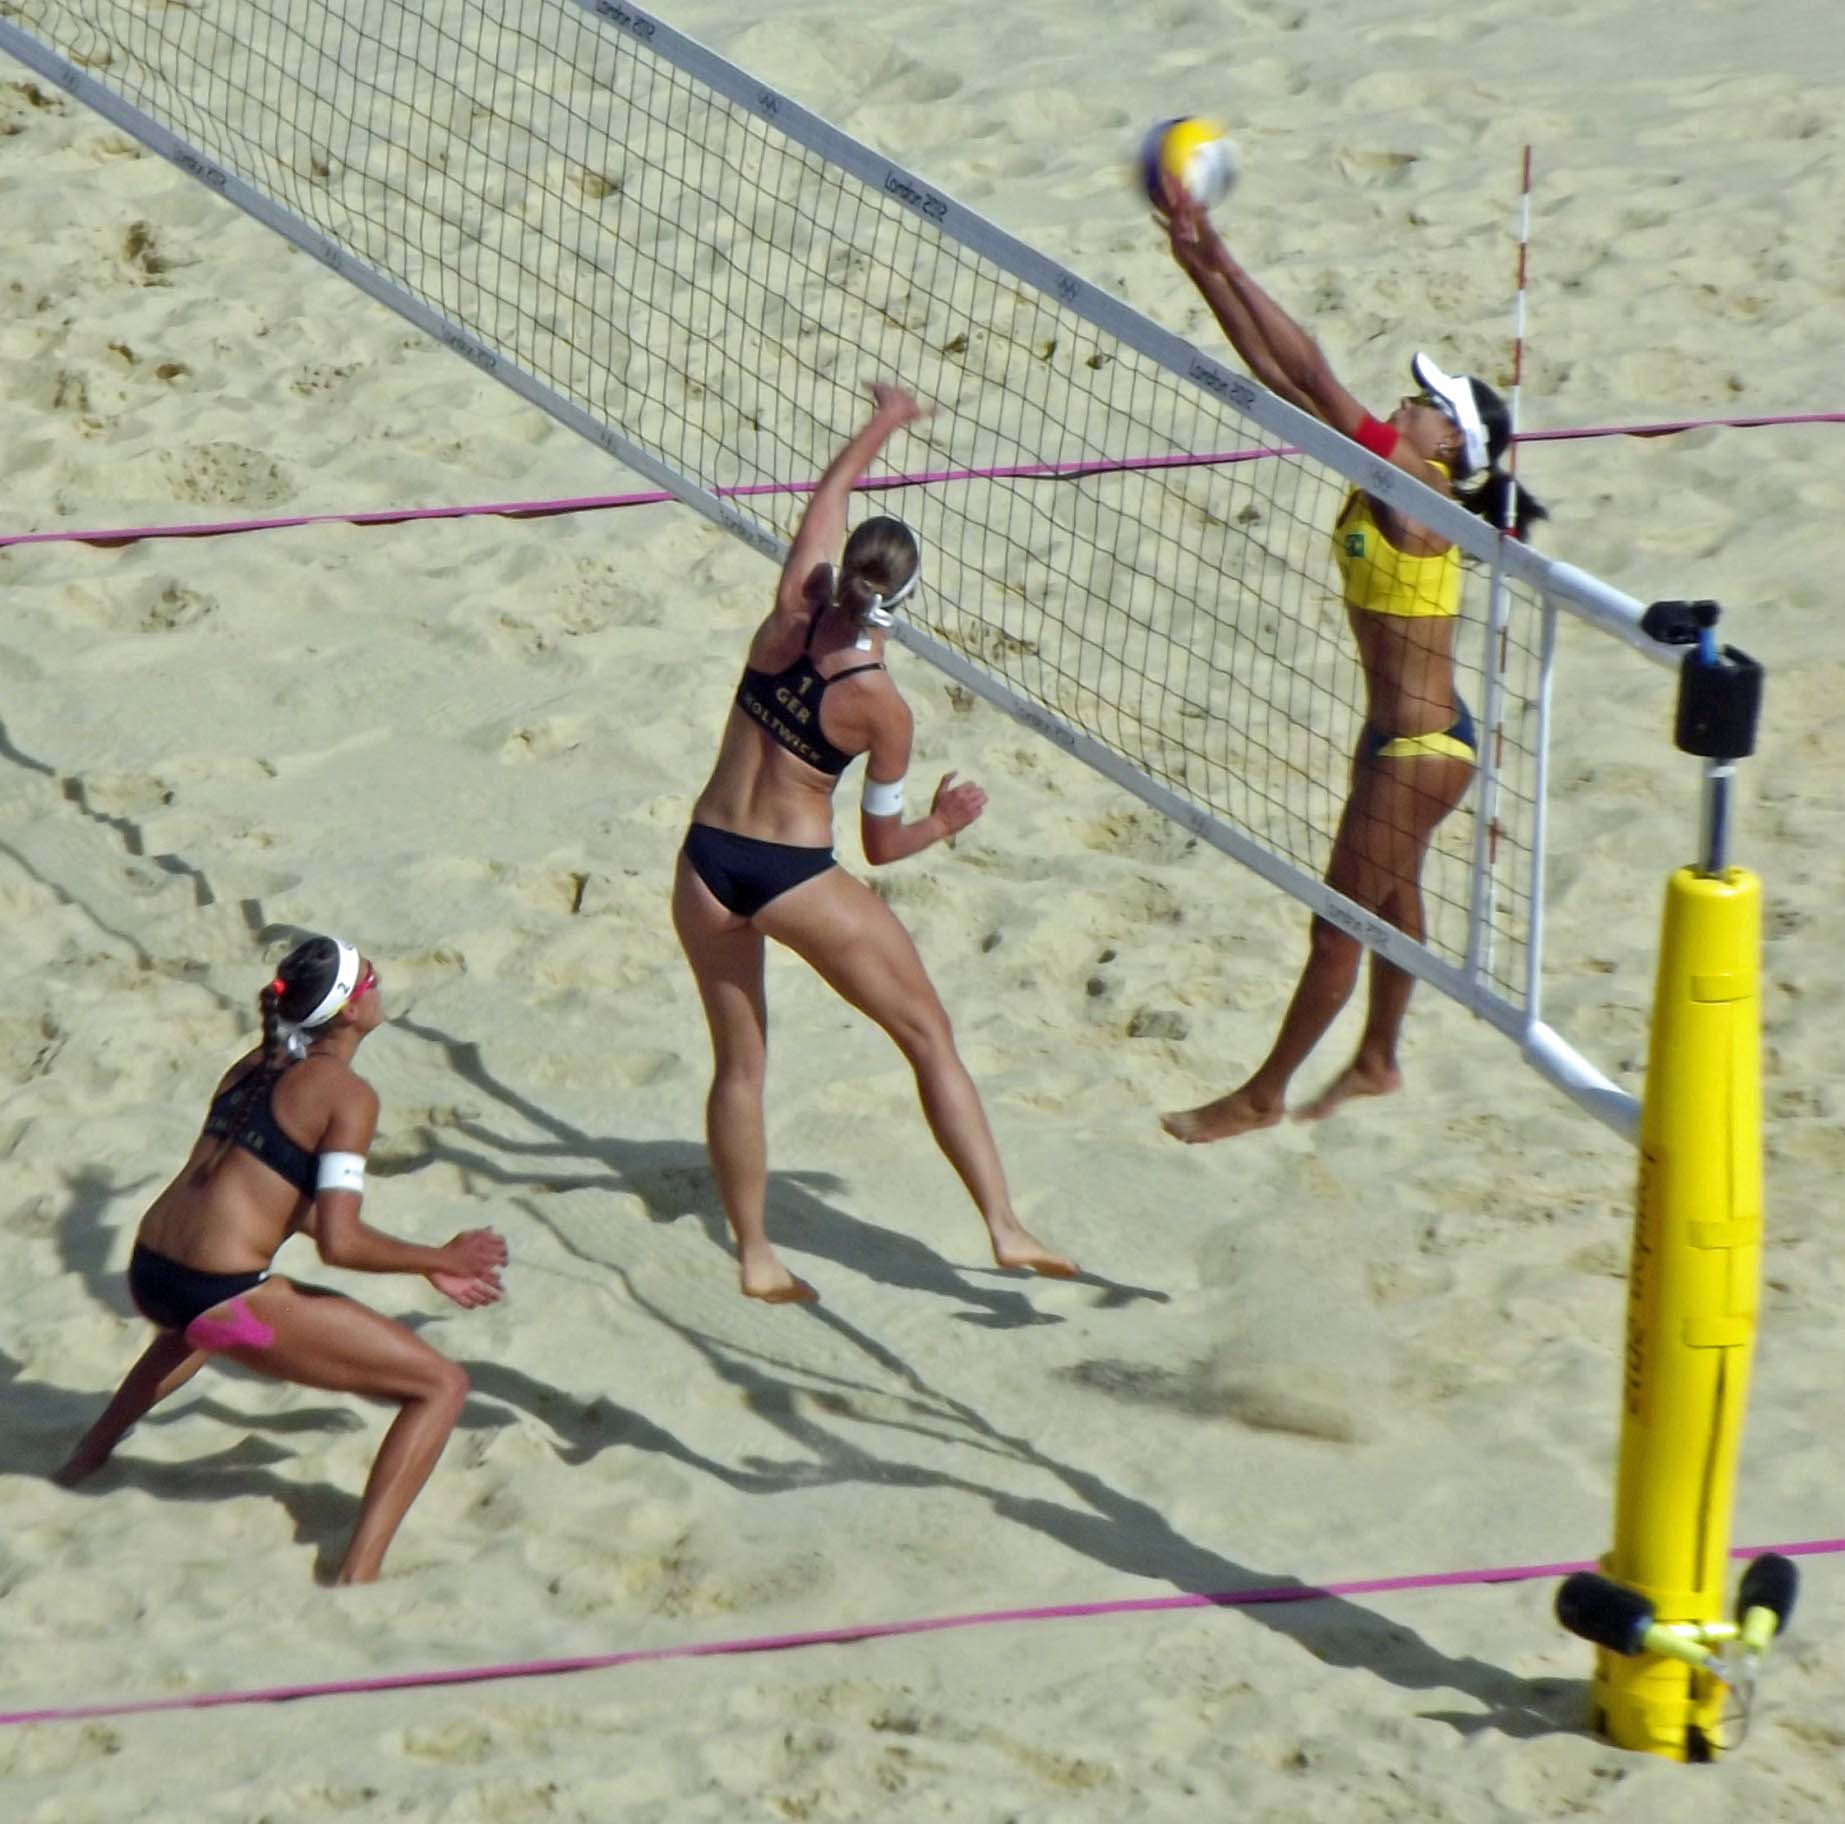 Three women playing beach volleyball